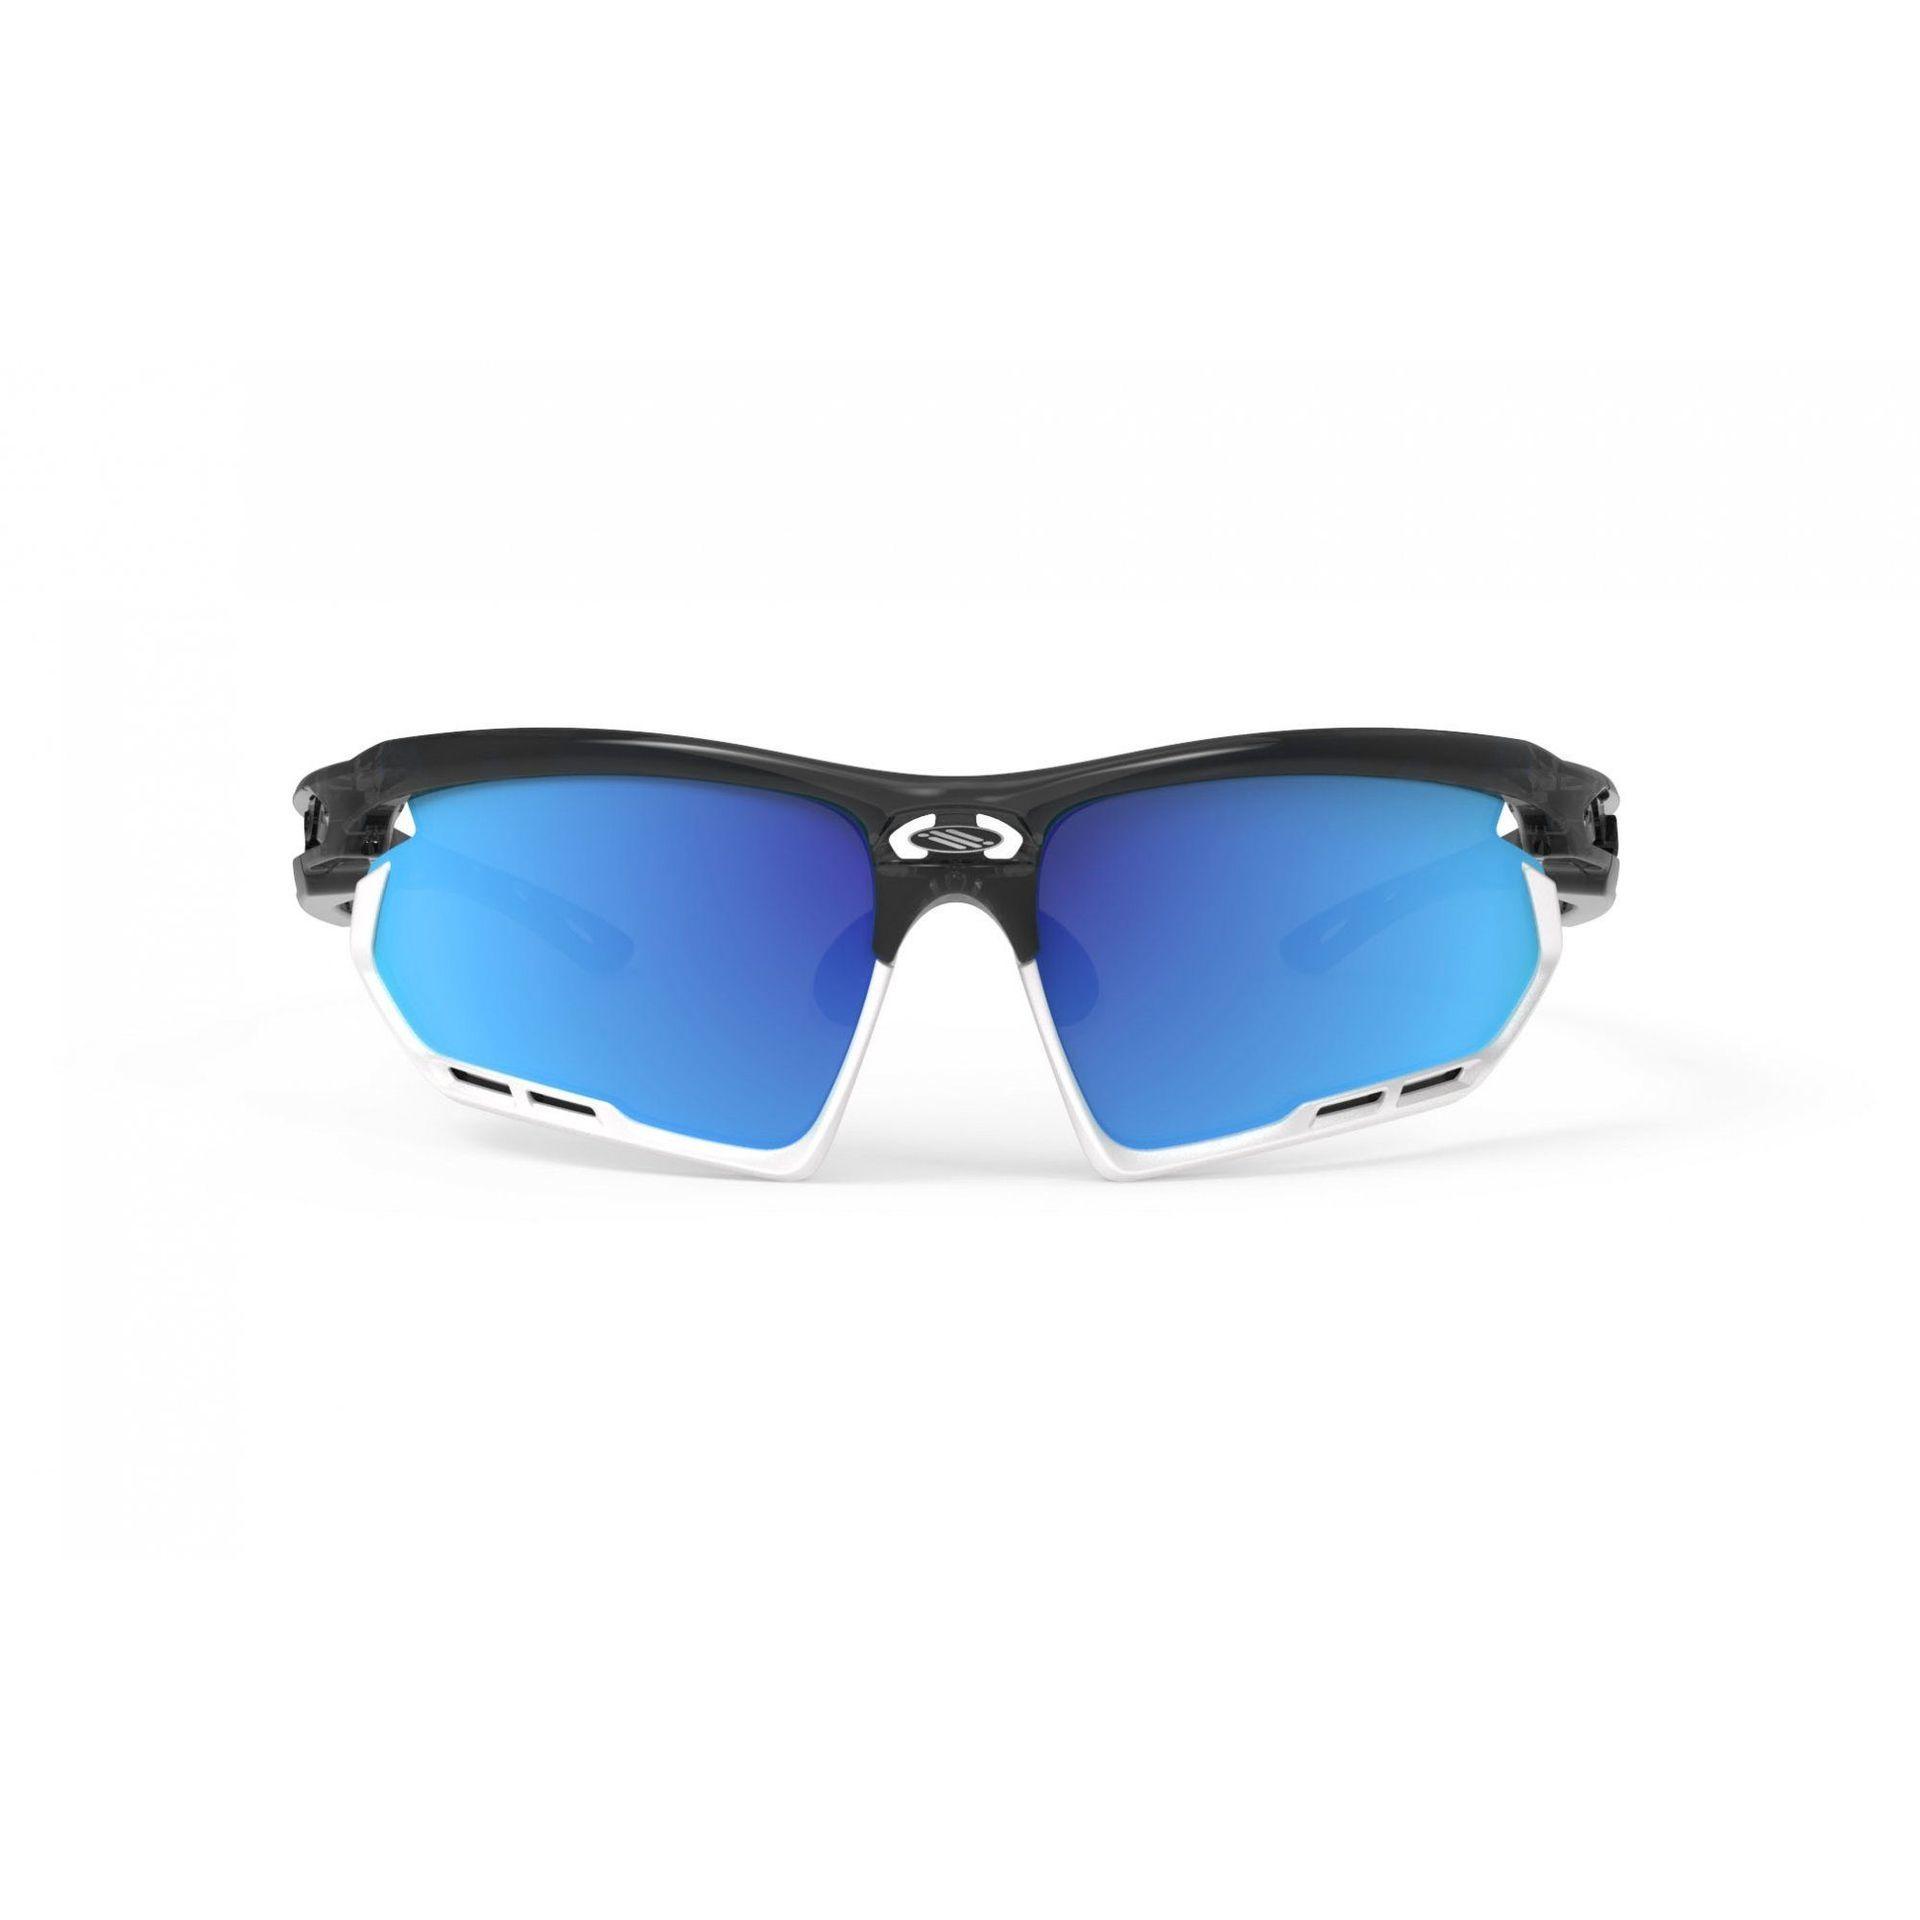 OKULARY RUDY PROJECT FOTONYK GRAPHITE|WHITE + ML BLUE SP453995 2